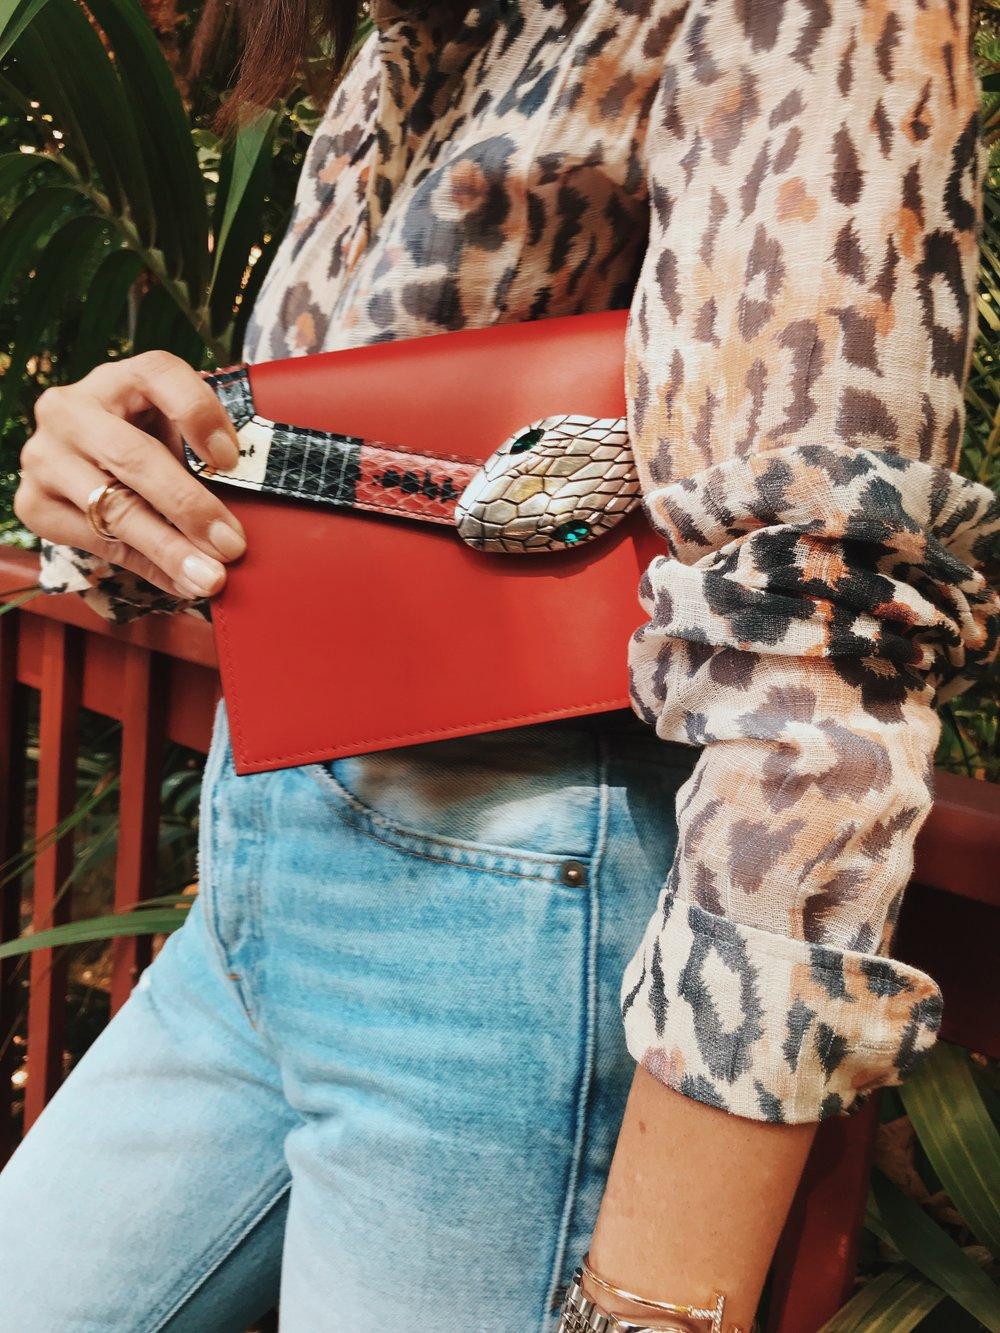 Jeans: frame | blouse: chloe | bag: gucci | Pumps: prada | sunglasses: cartier | Hair: nicolas flores | Make-up: Blushington | Photo: Drew evans